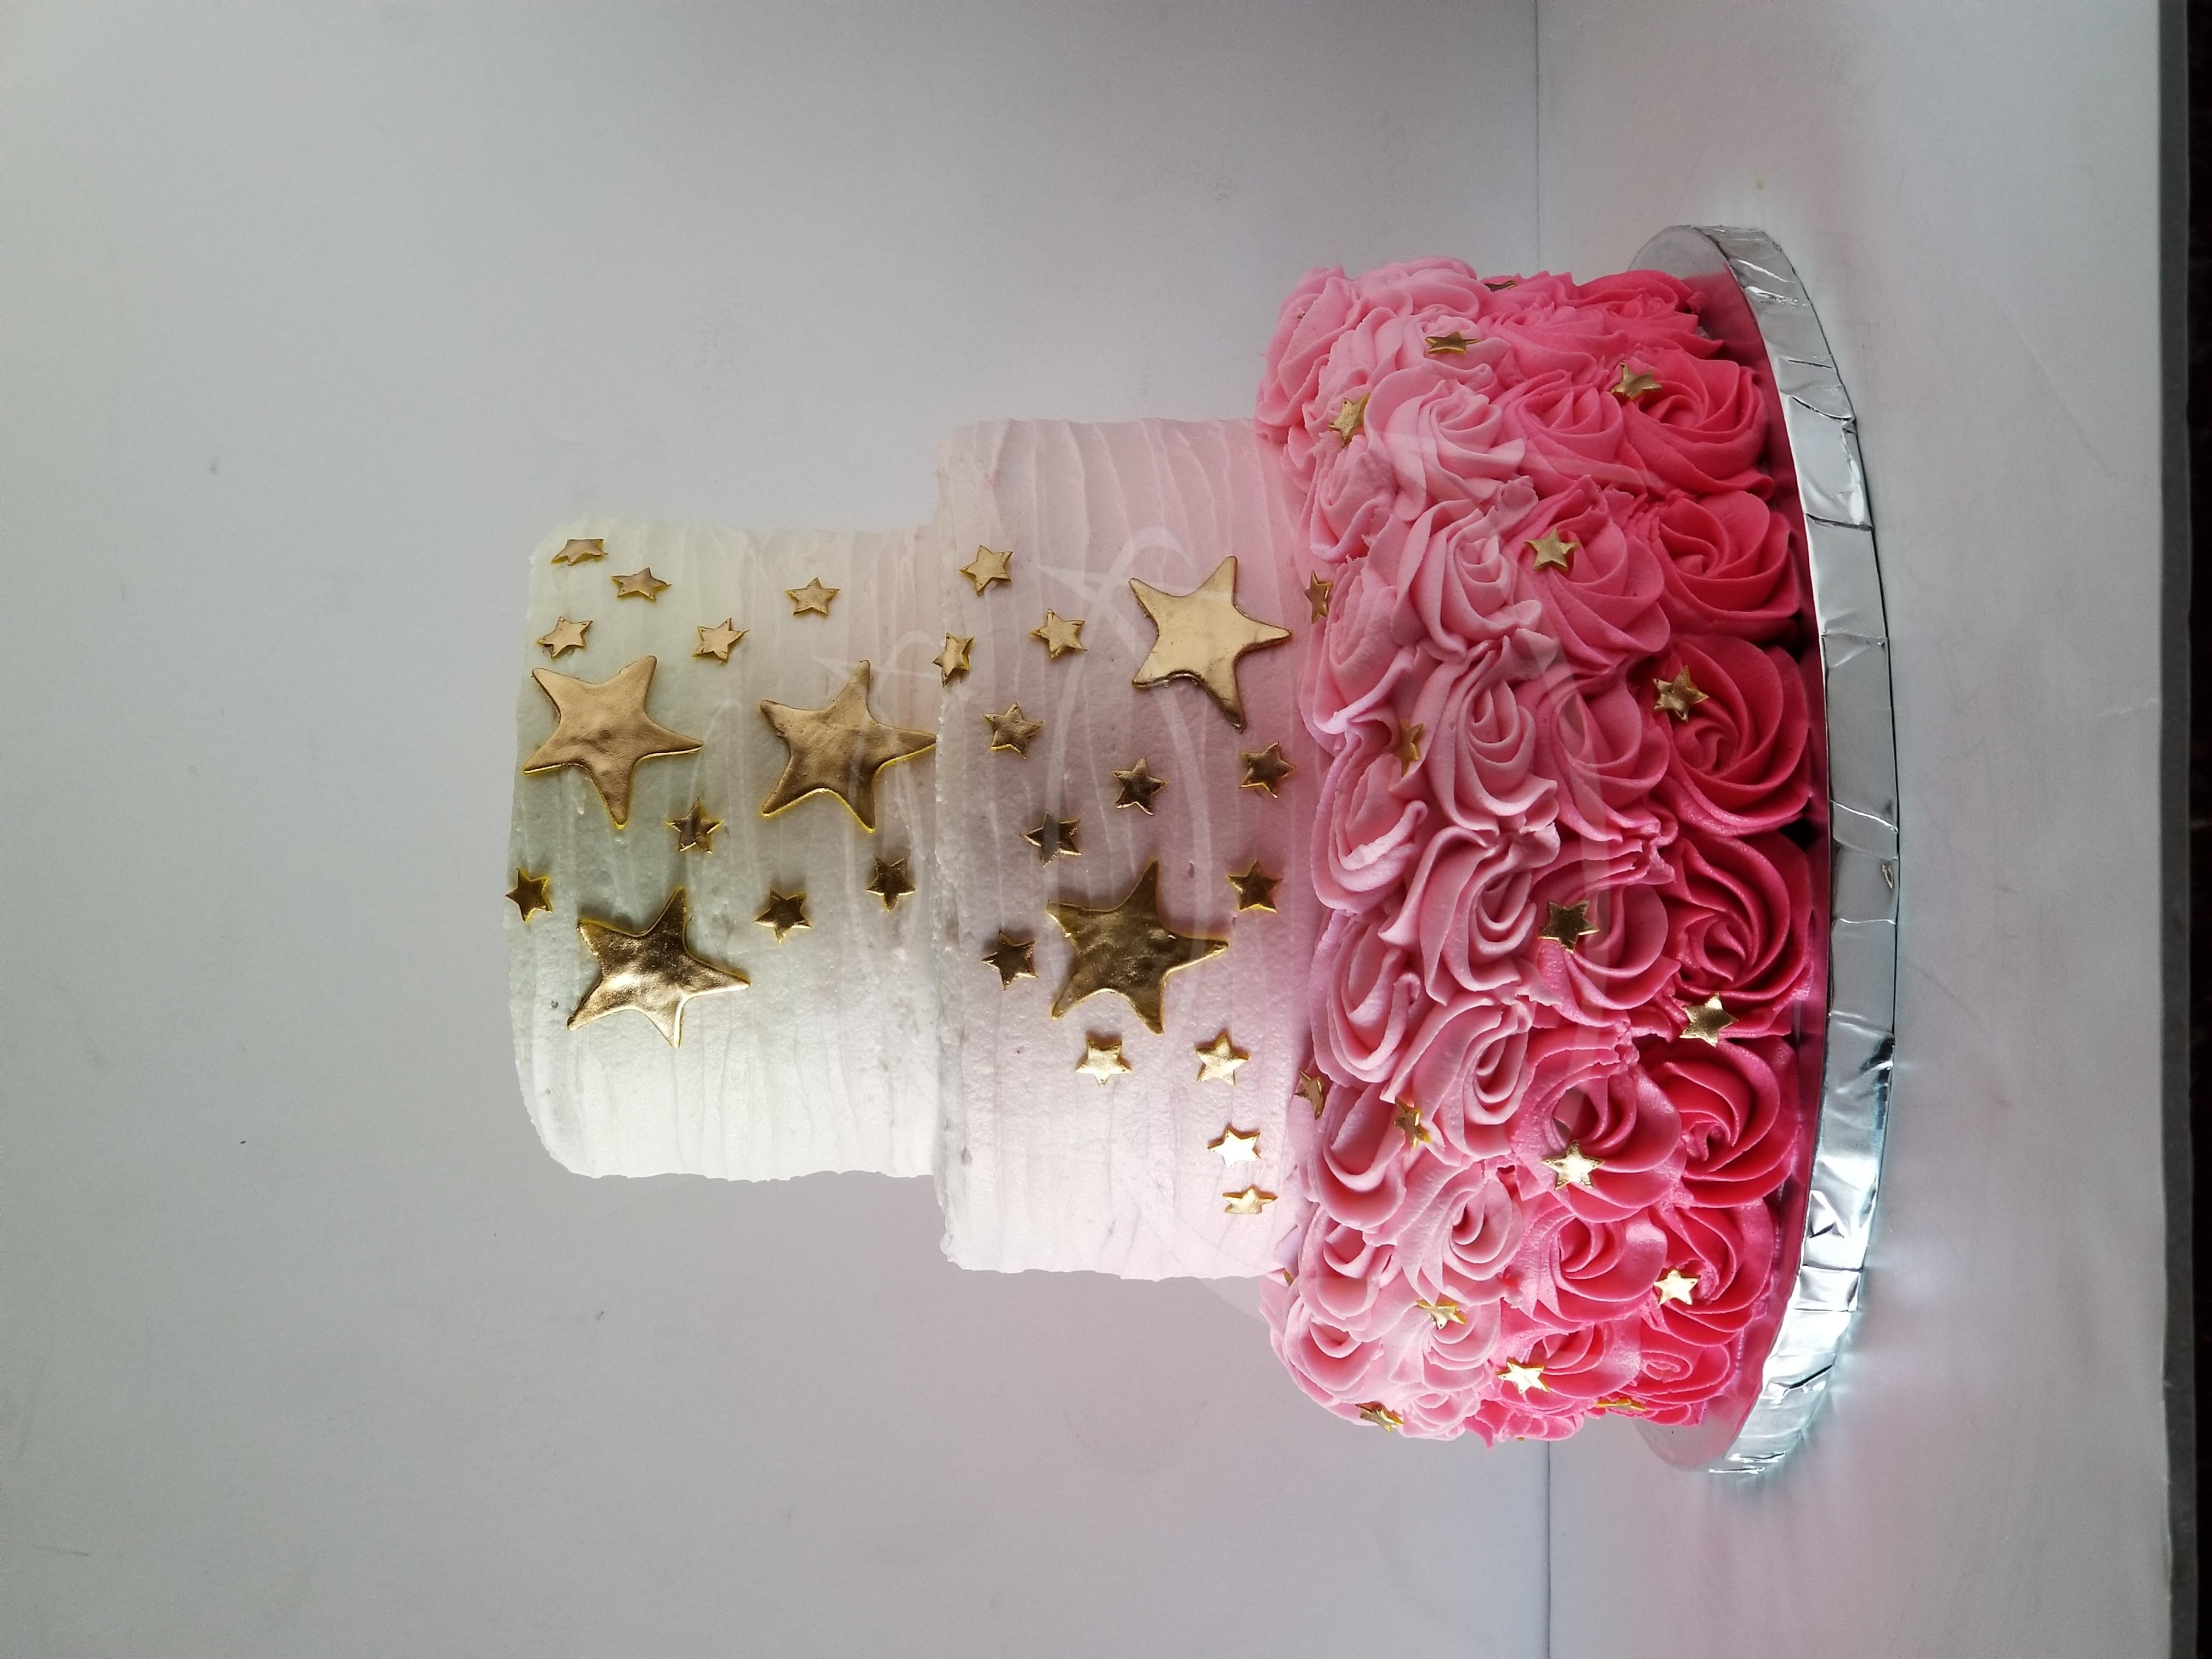 pinkombrerossettecake